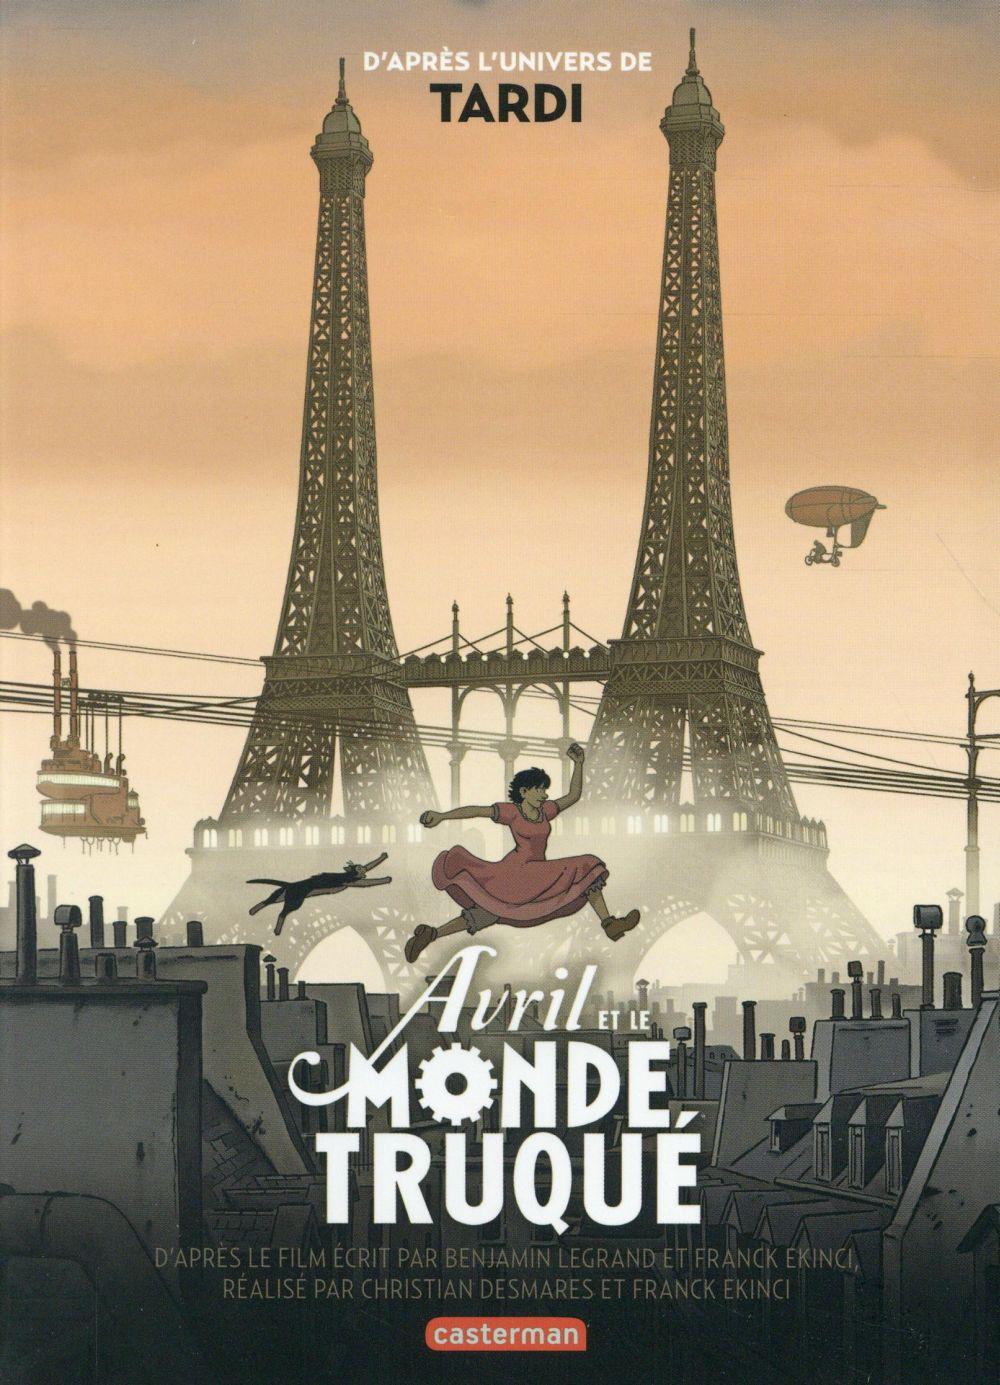 AVRIL ET LE MONDE TRUQUE - LE ROMAN DU FILM BARFETY/TARDI/SAADA Casterman